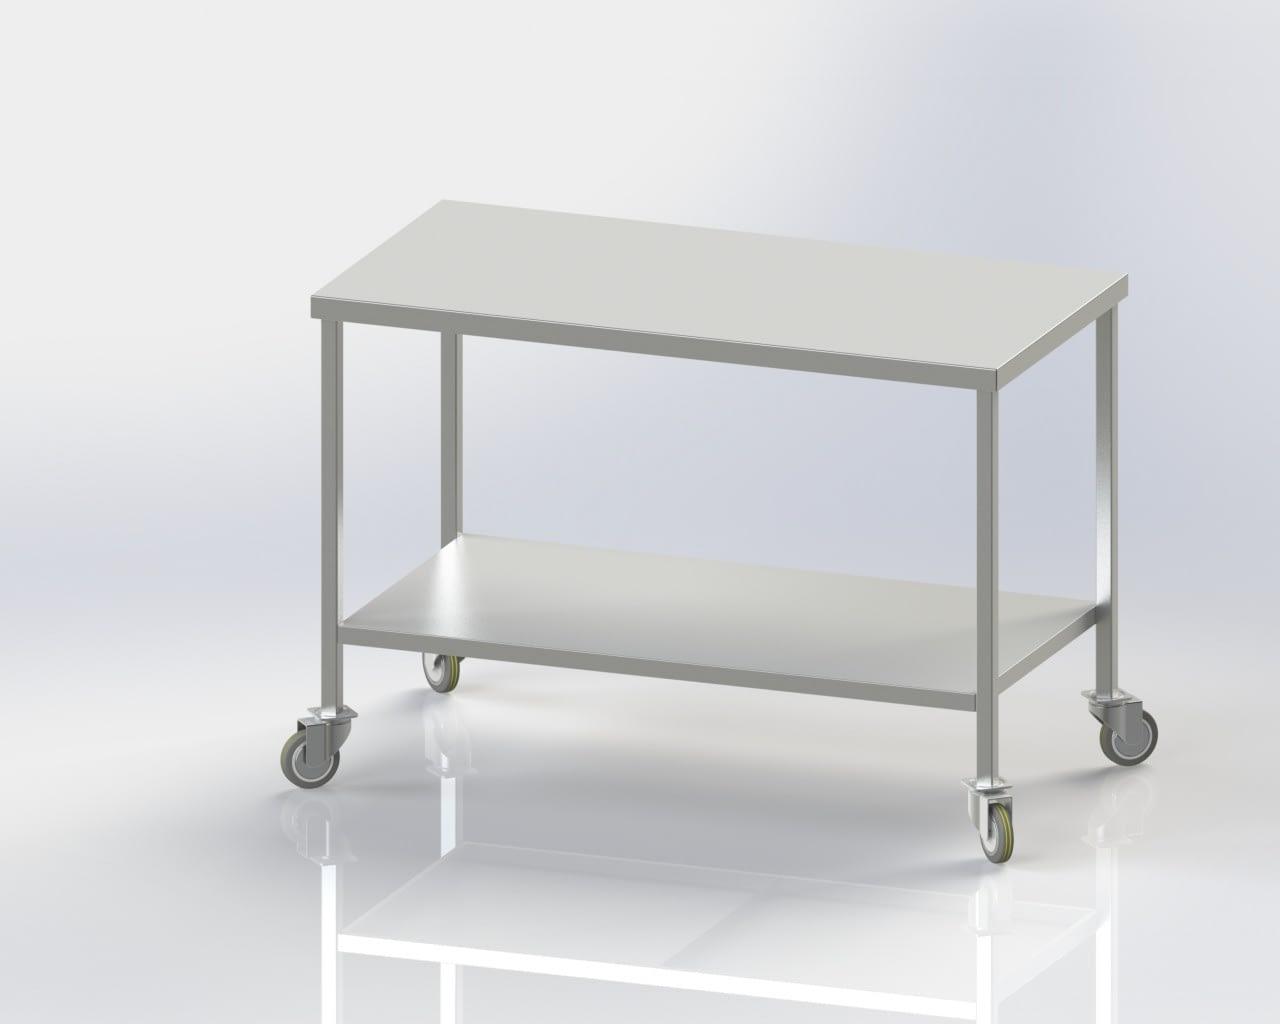 Mobile Table/Lower shelf